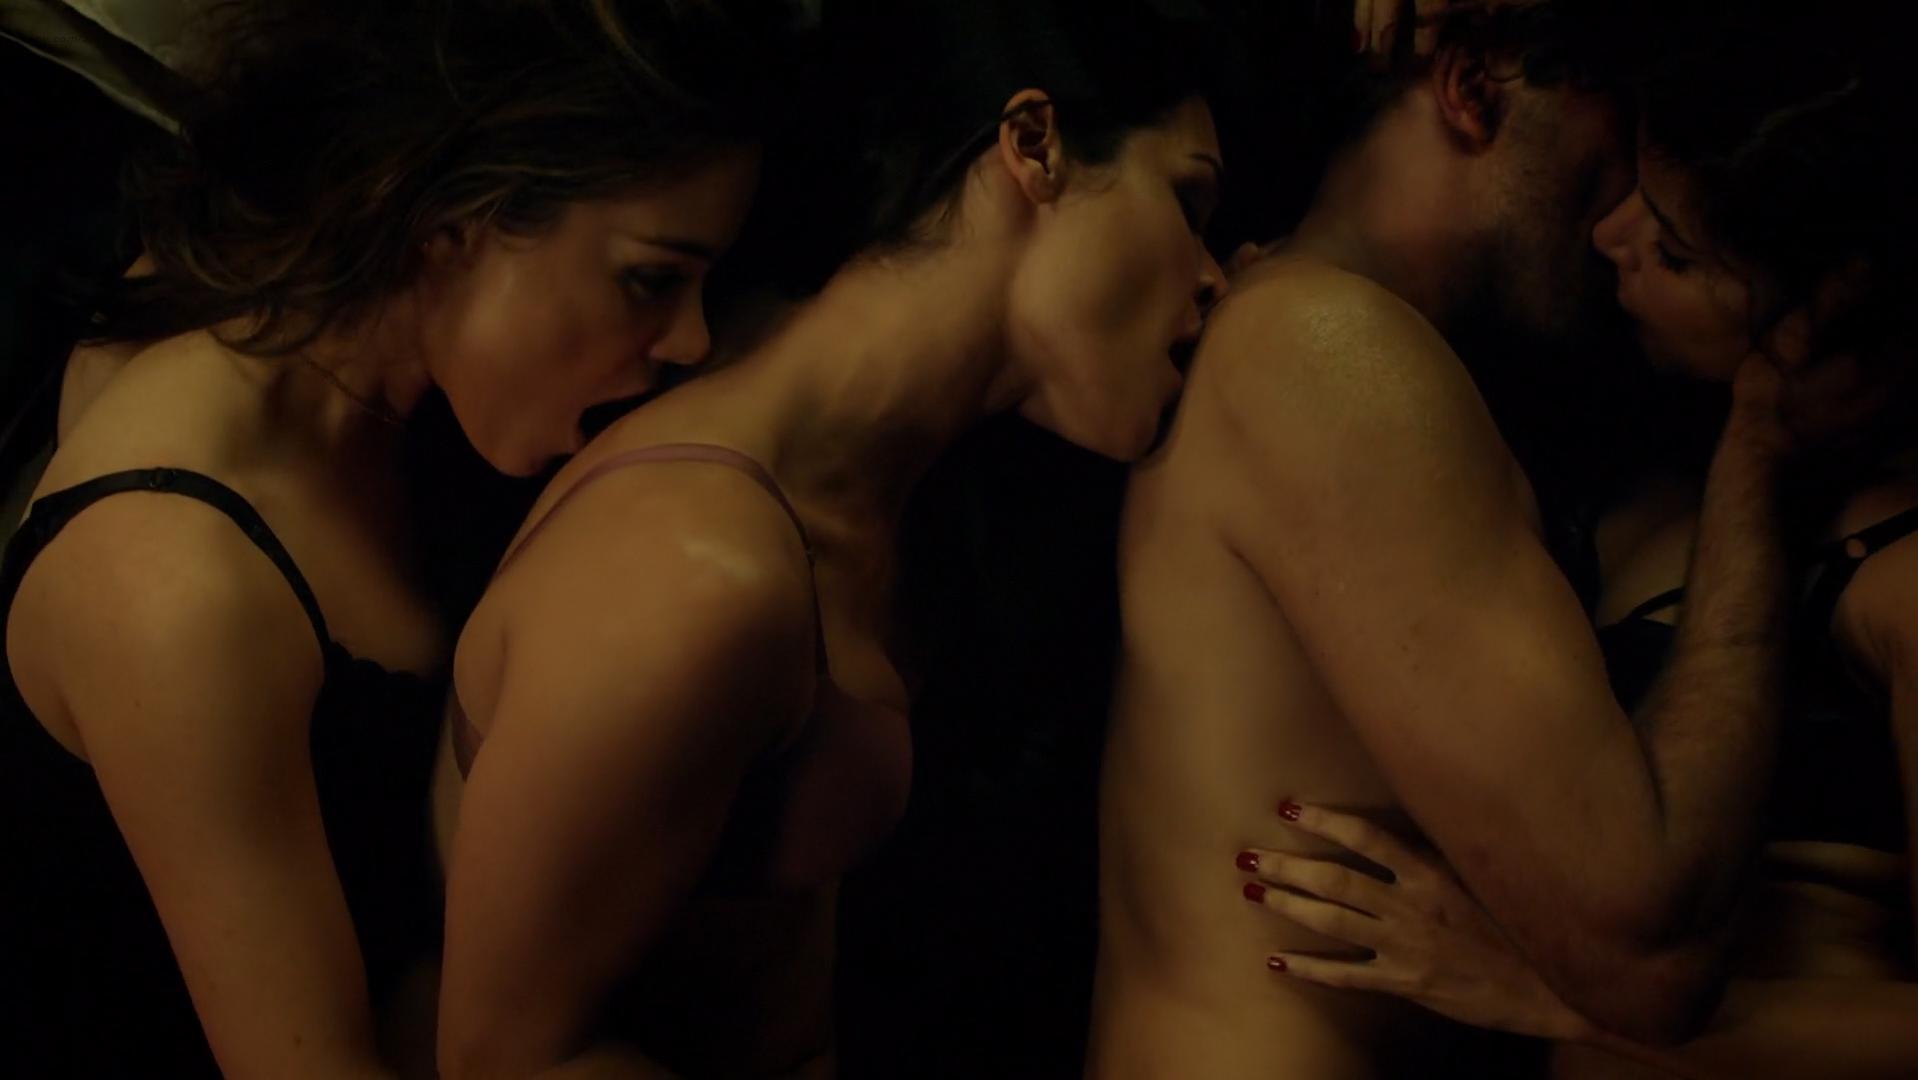 Roxanne McKee sexy, Kim Engelbrecht sexy, Shivani Ghai sexy, Christina Chong nude - Dominion s02e08 (2015)